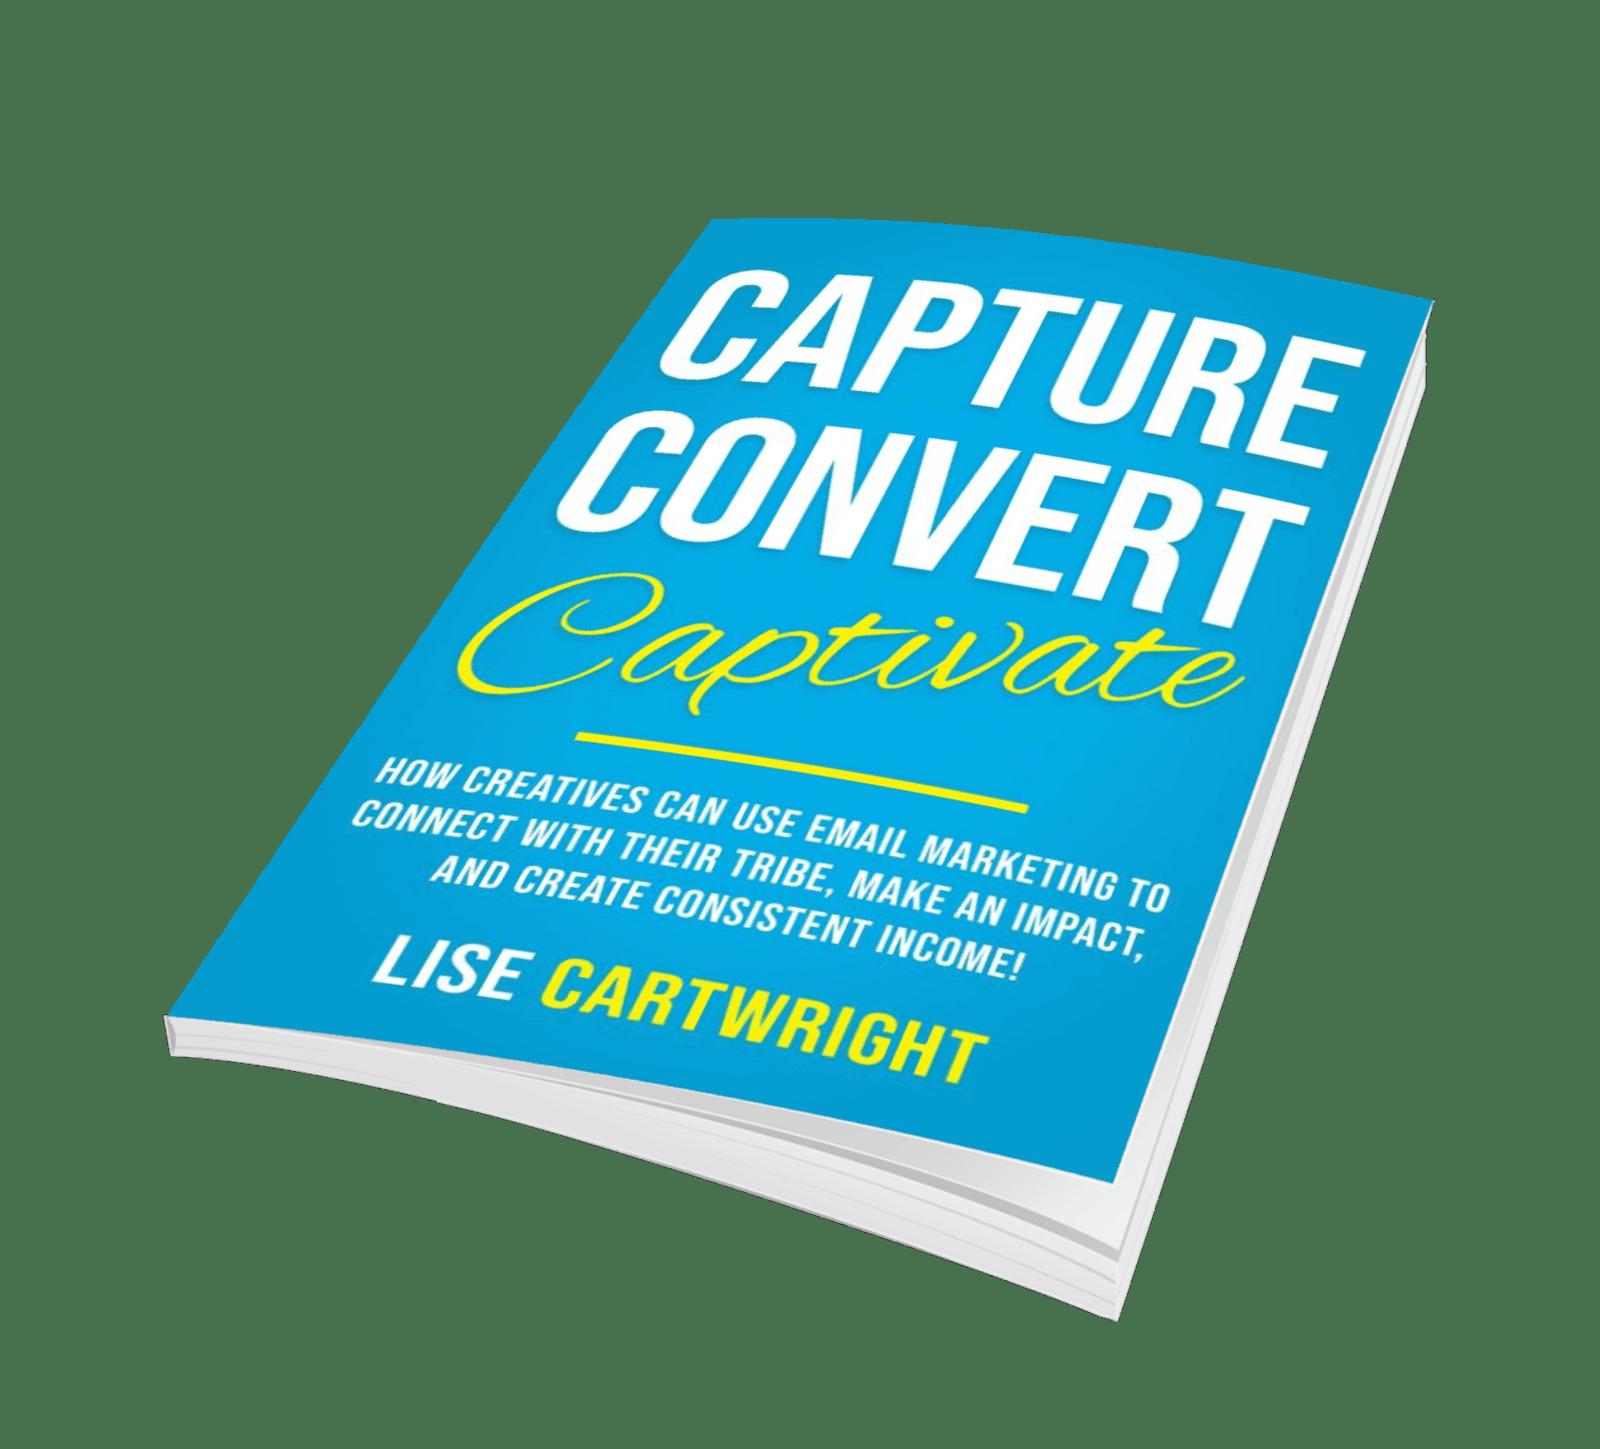 Capture Convert Captivate Workbook